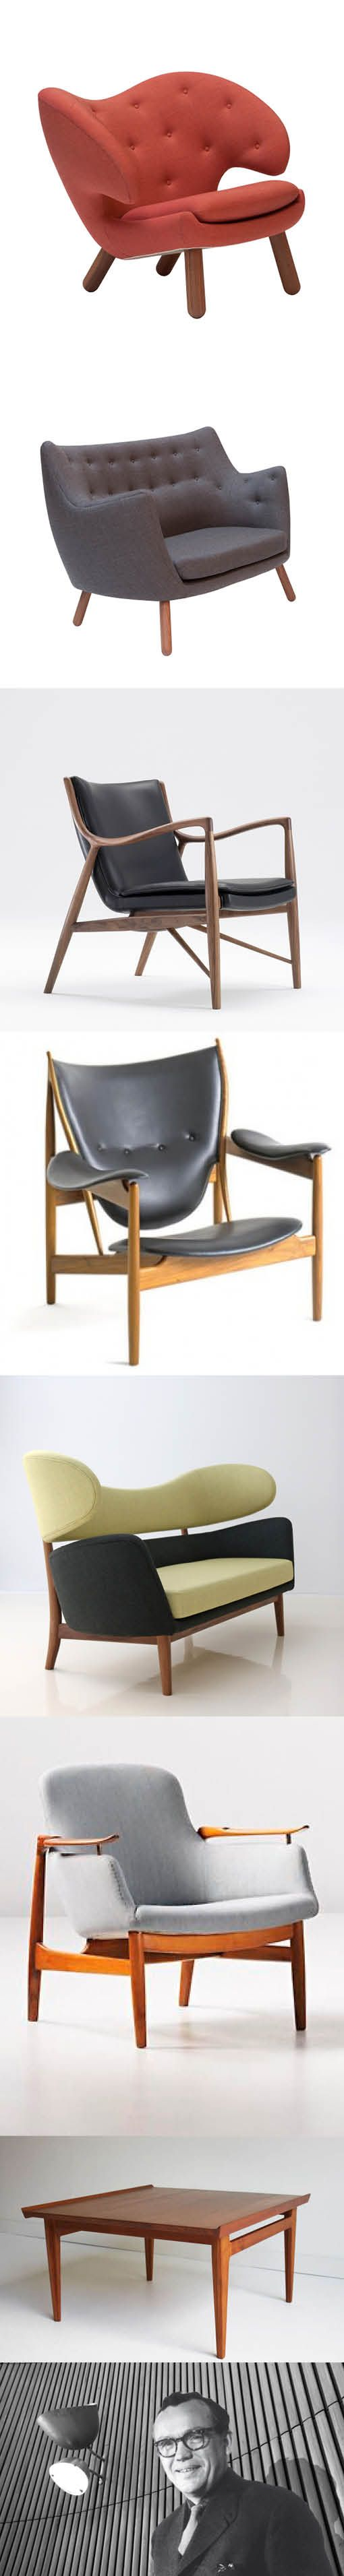 109 best furniture images on Pinterest